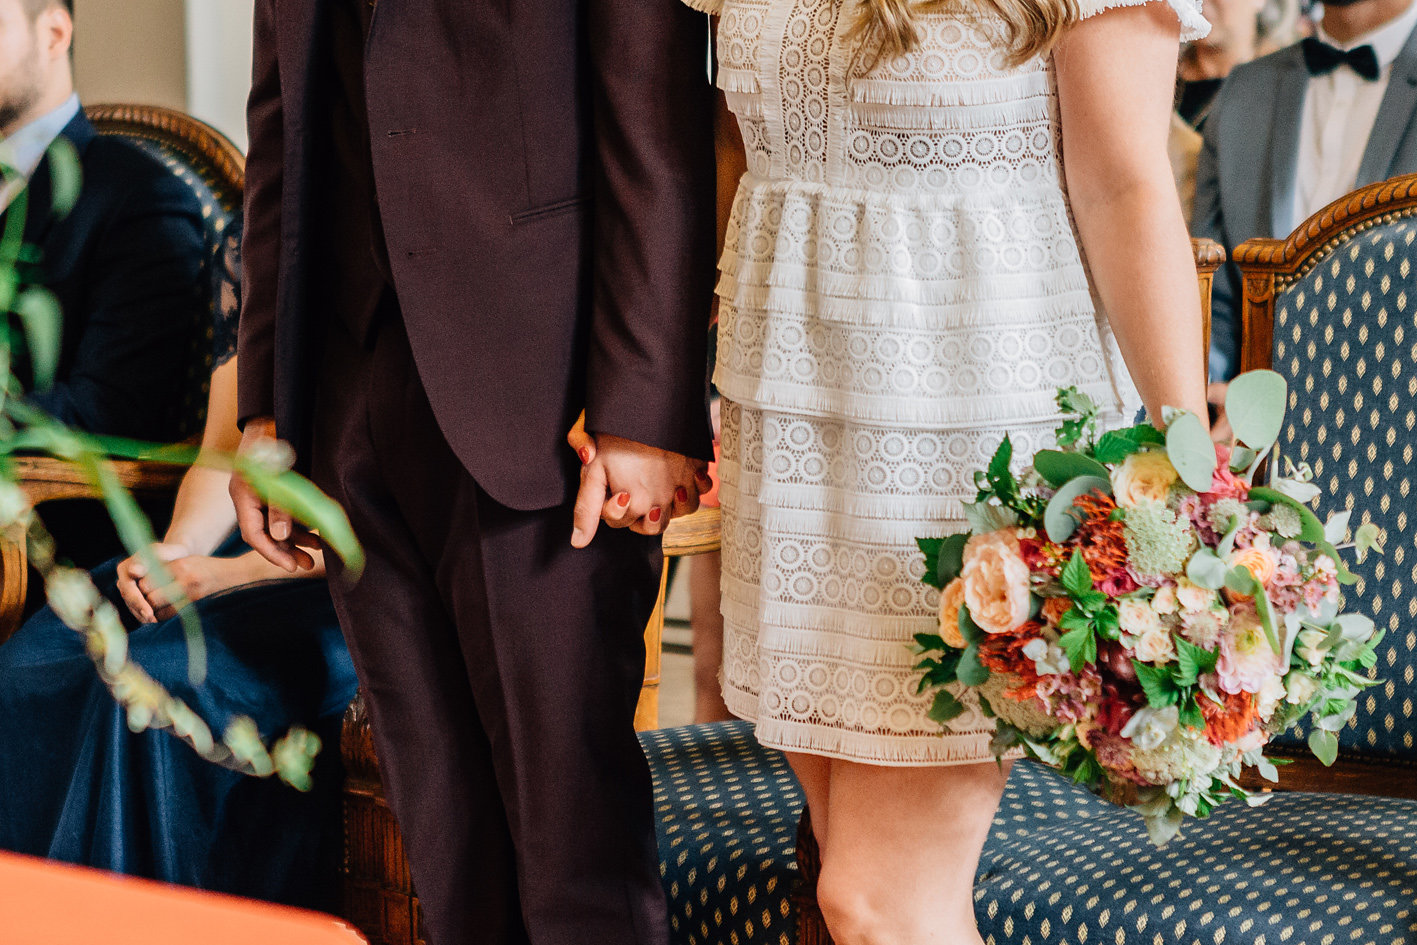 pierreatelier-photographe-mariage-paris-orangeriedevatimesnil-081.jpg